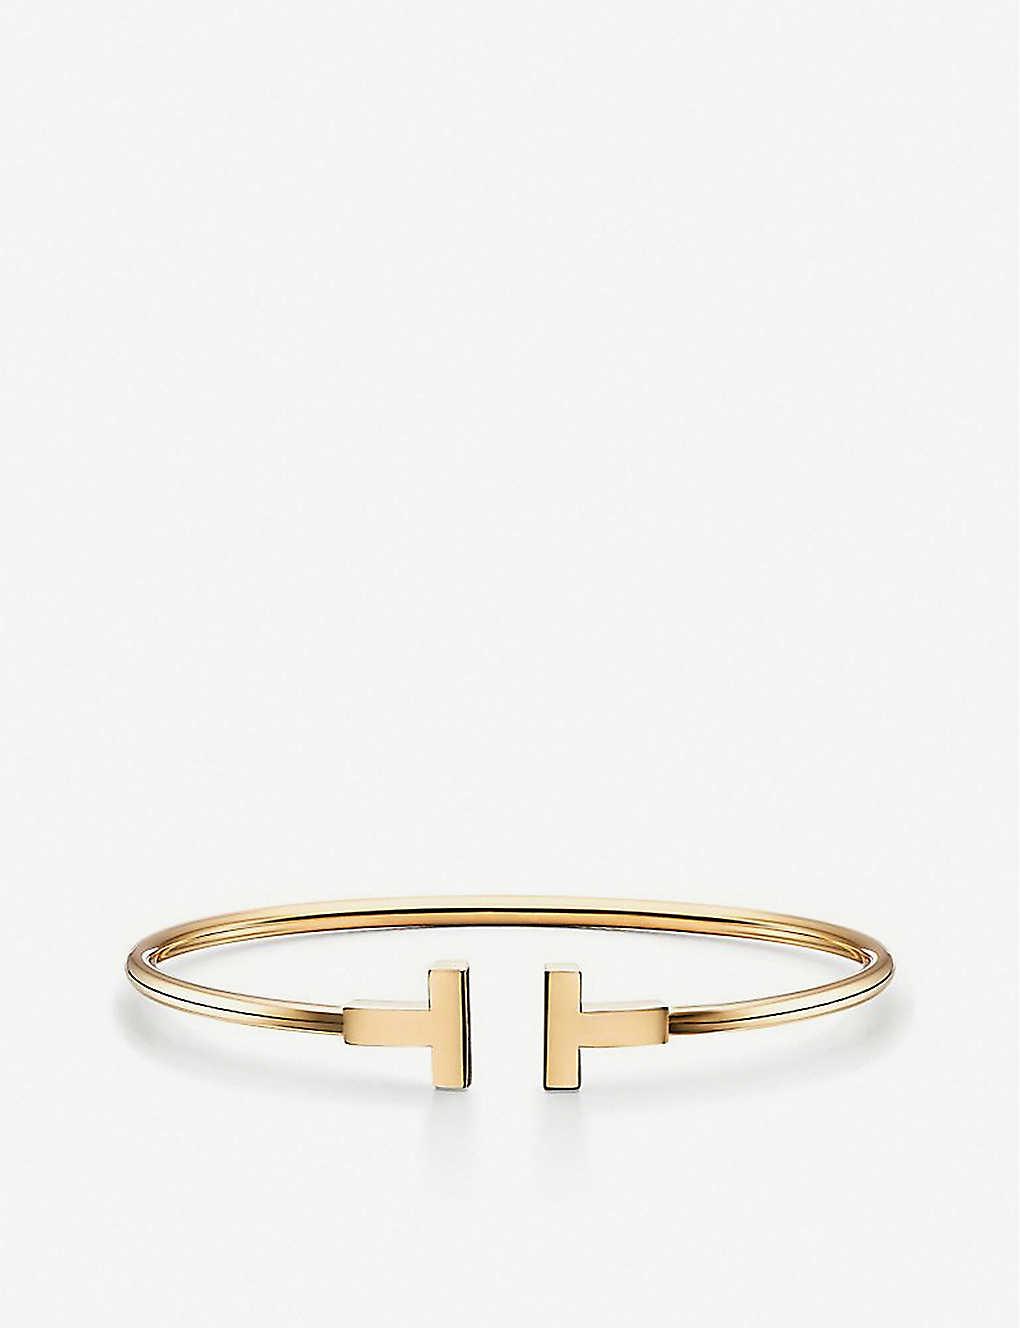 ed52cb865828 TIFFANY   CO - Tiffany T wire bracelet in 18k gold